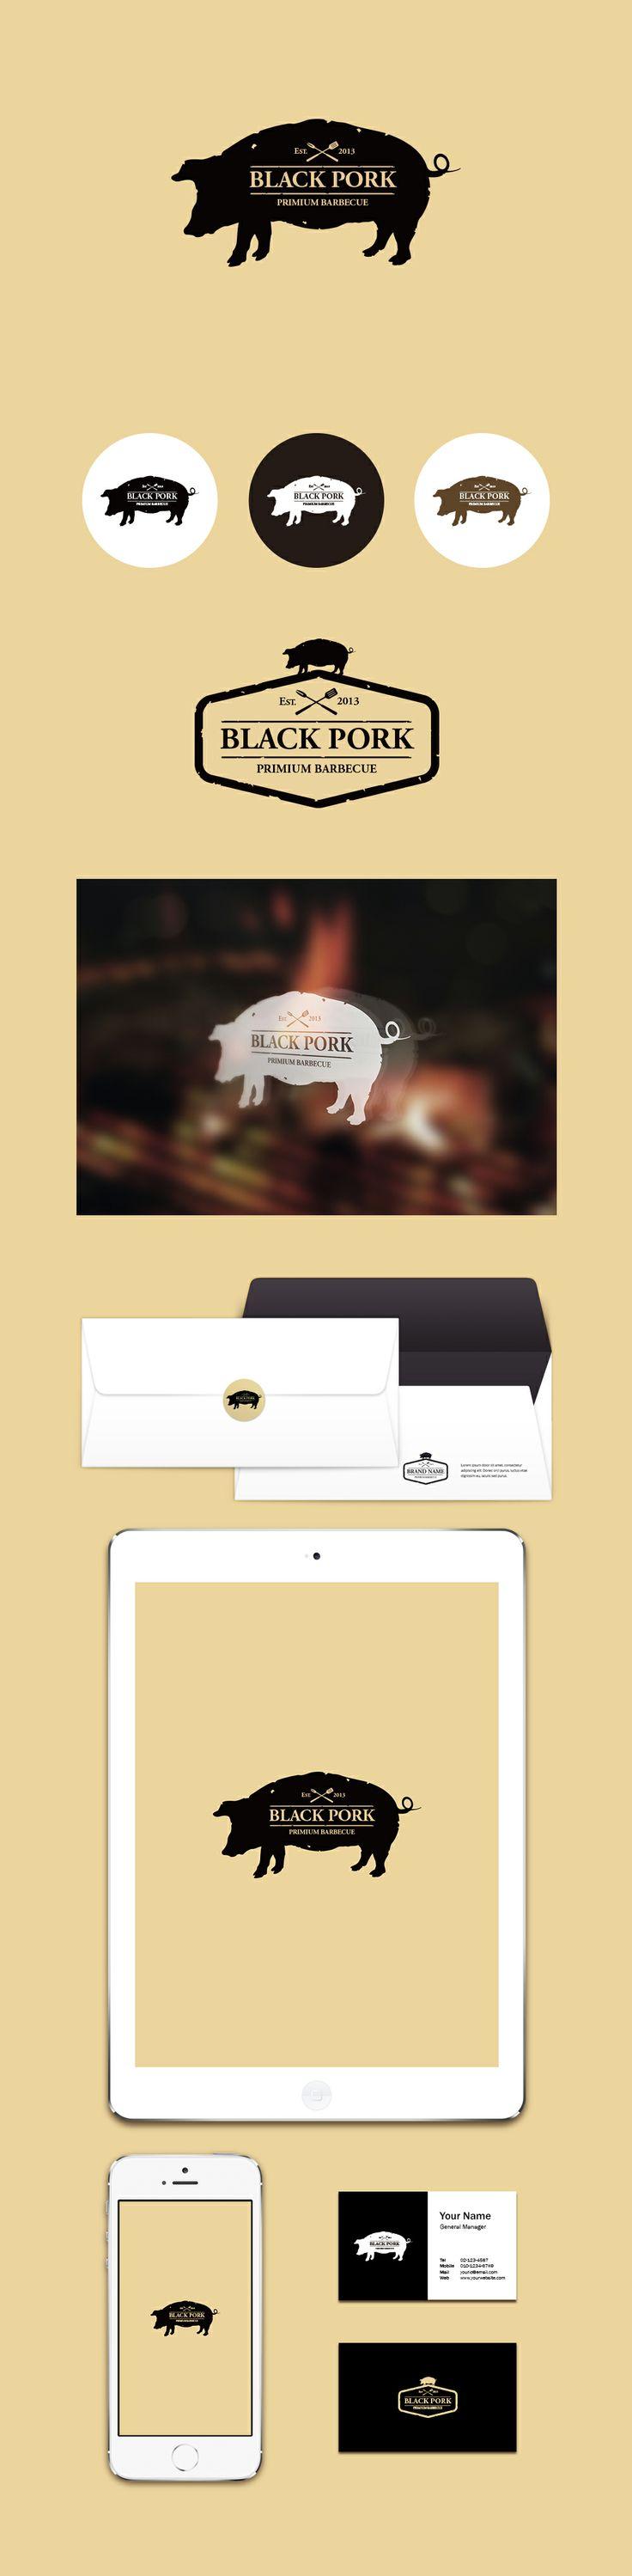 Black Pork [Logo Design By Conoi]